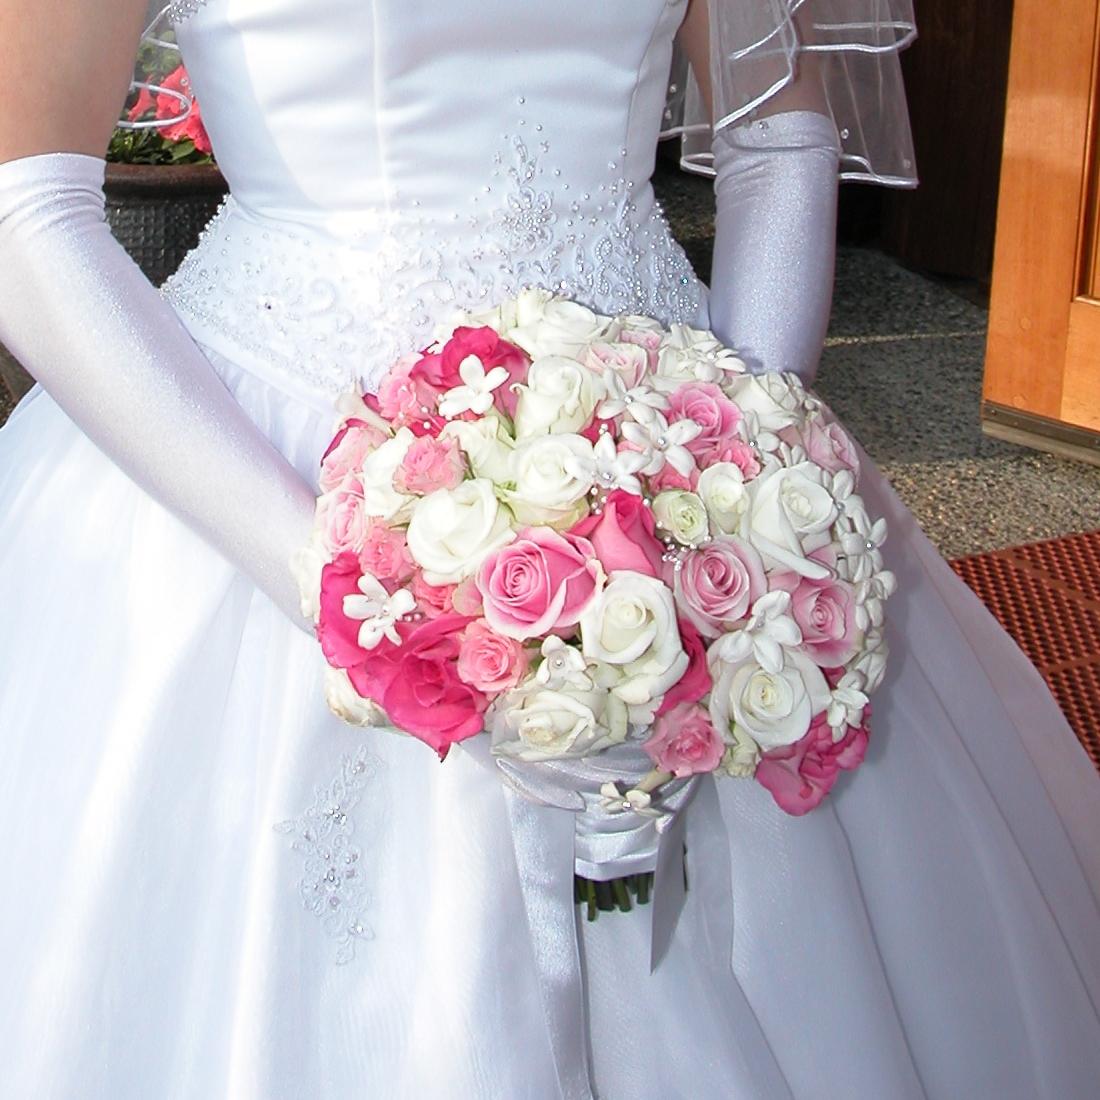 Barstow Flower Bridal Boutique : Junggesellenabschied